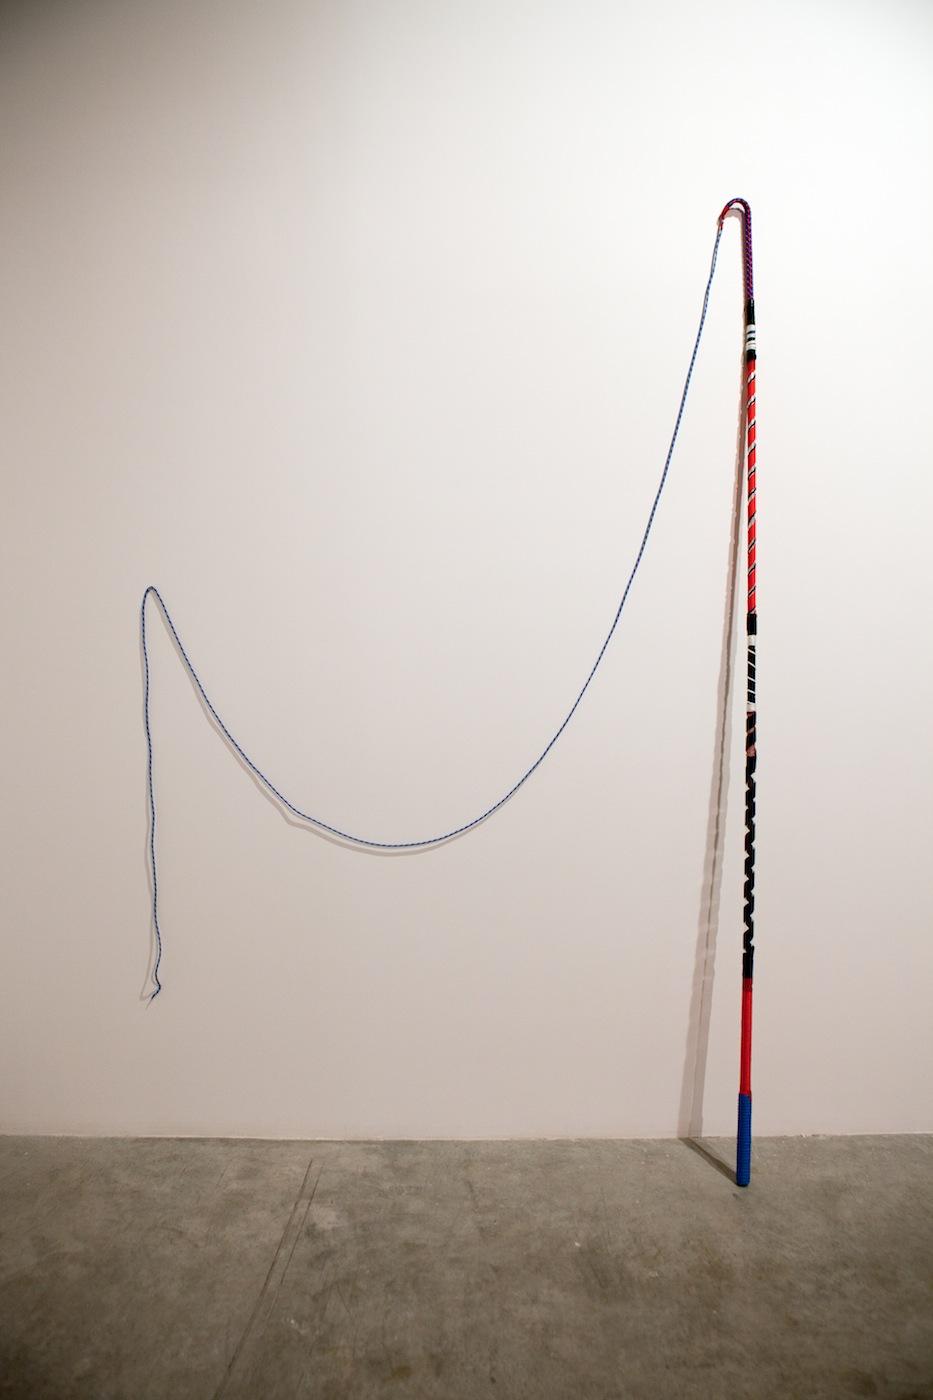 Judith Hopf  Untitled 2008 Plexiglass, nylon cord, sticky tape, rope 220 x 3 cm